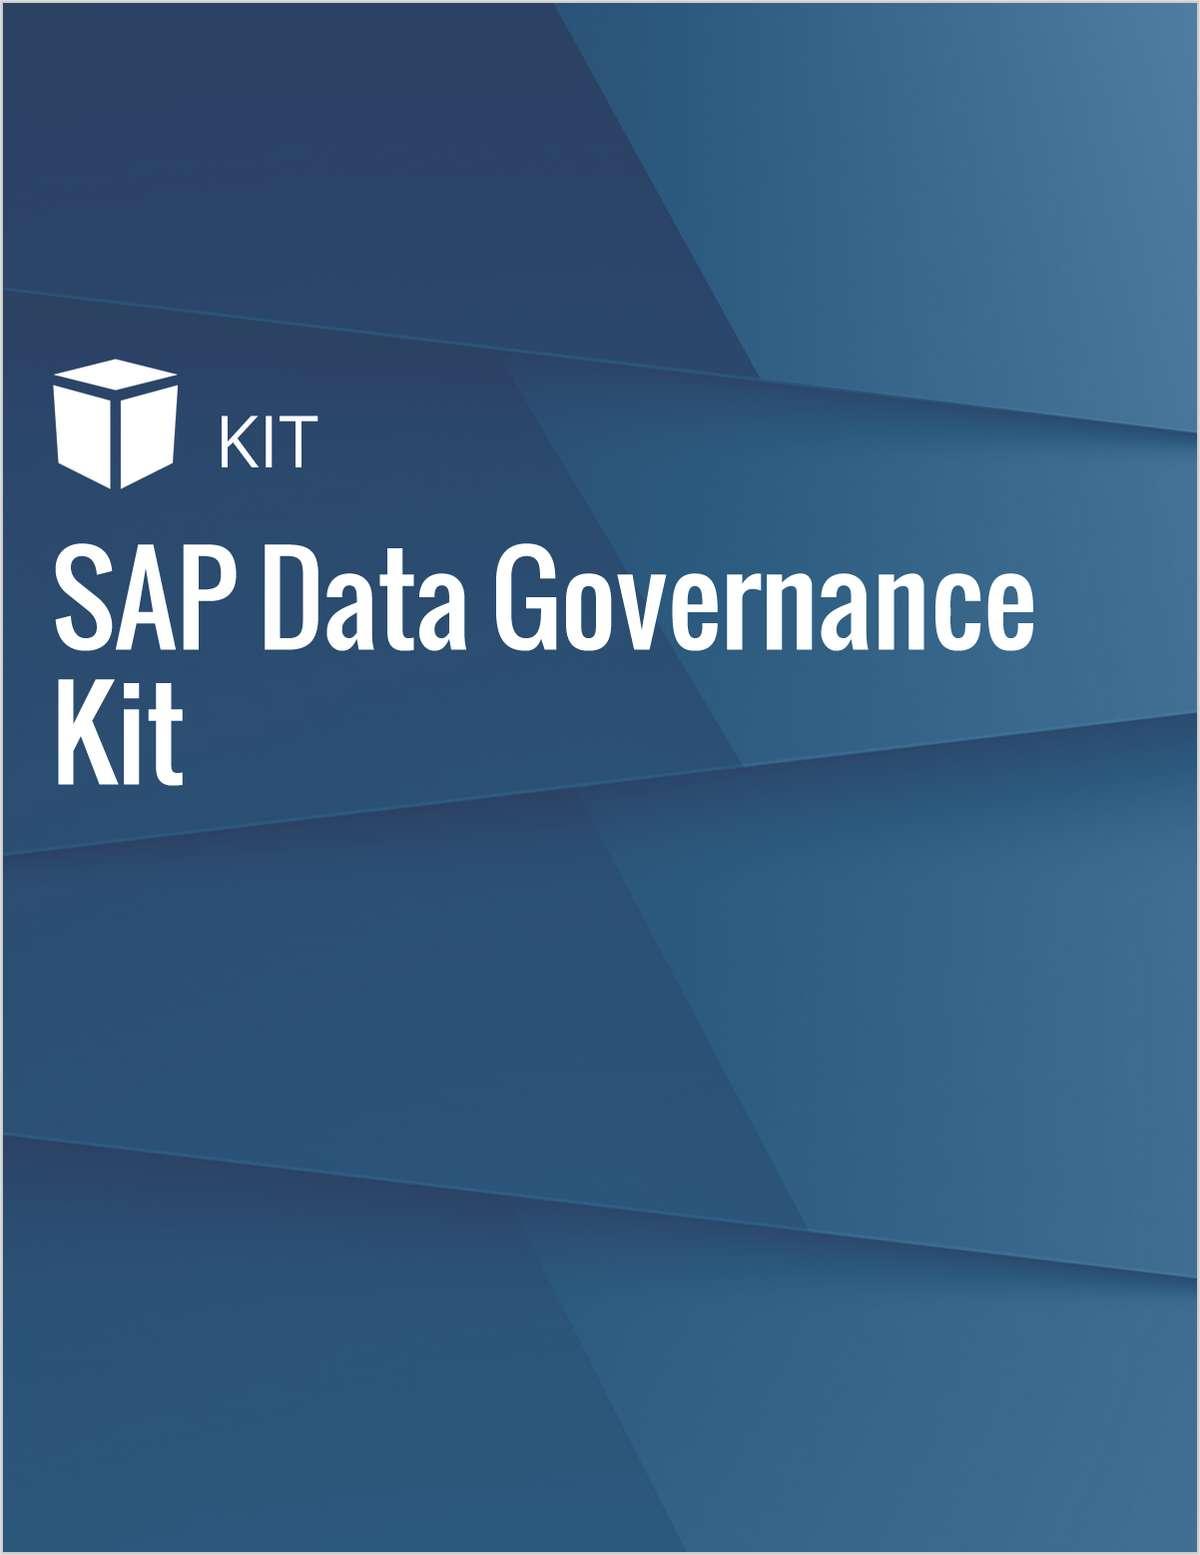 SAP Data Governance Kit